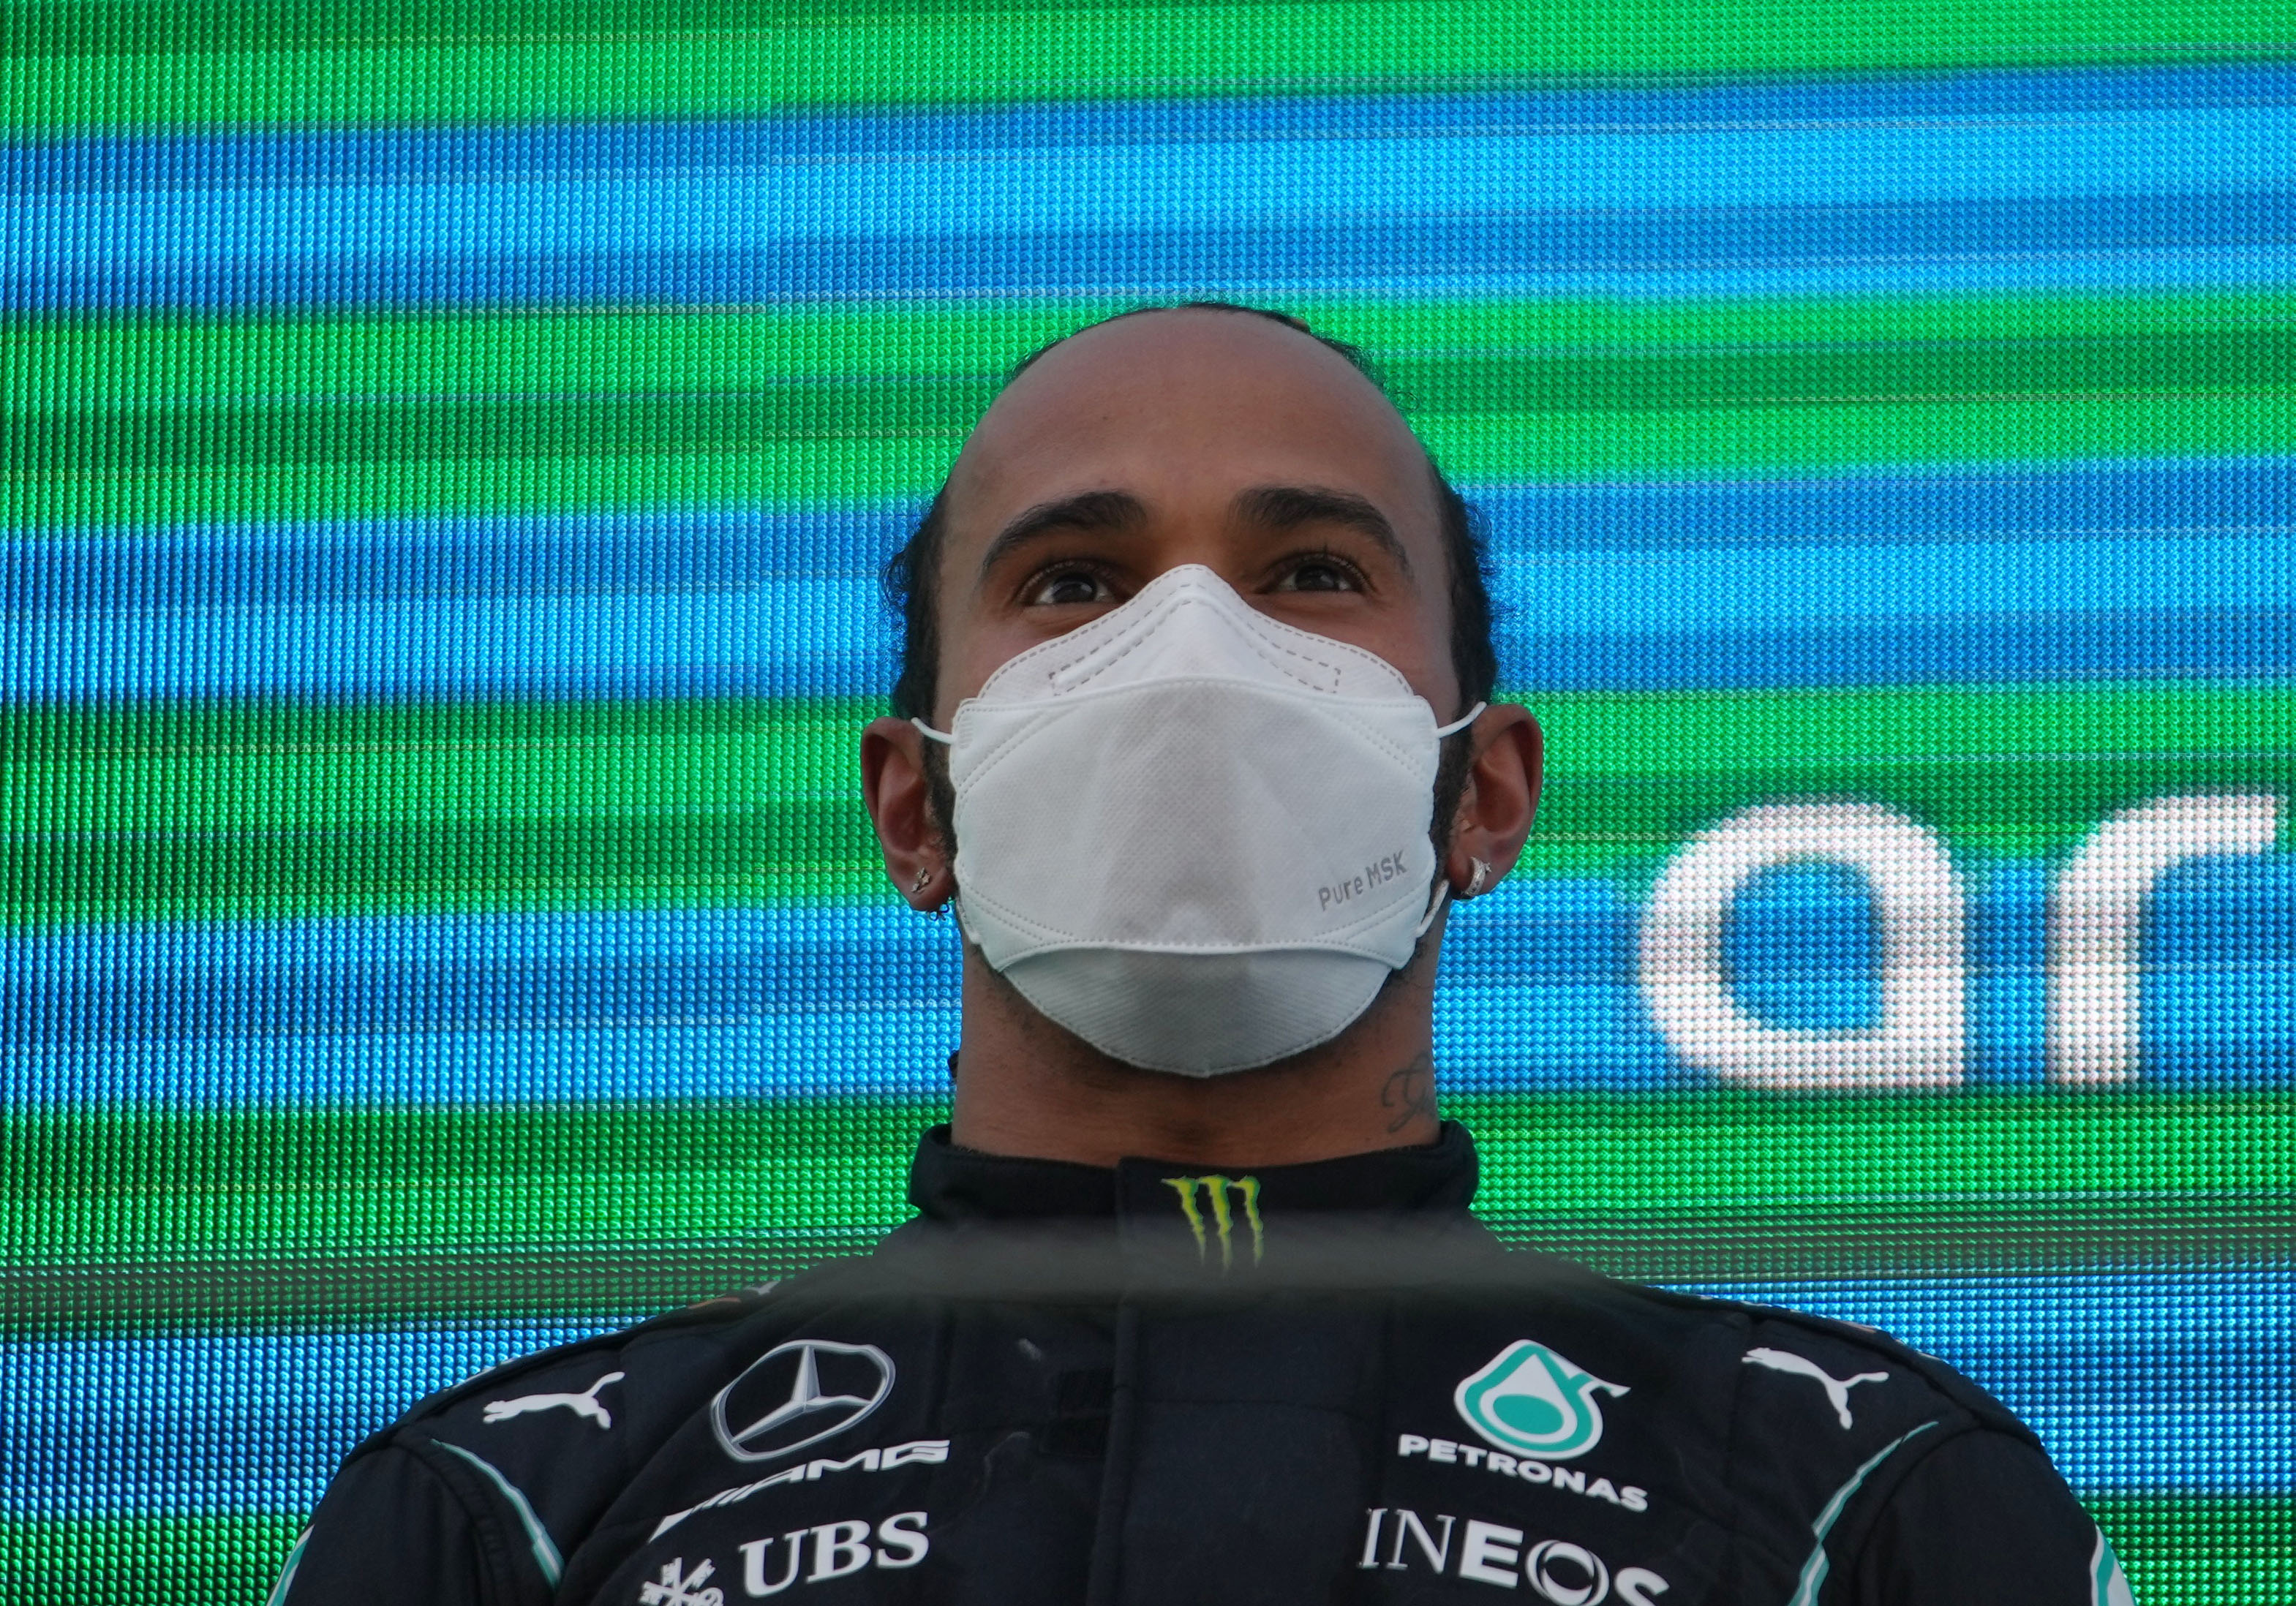 Formula One F1 - Spanish Grand Prix - Circuit de Barcelona-Catalunya, Barcelona, Spain - May 9, 2021 Mercedes' Lewis Hamilton after winning the race Pool via REUTERS/Emilio Morenatti